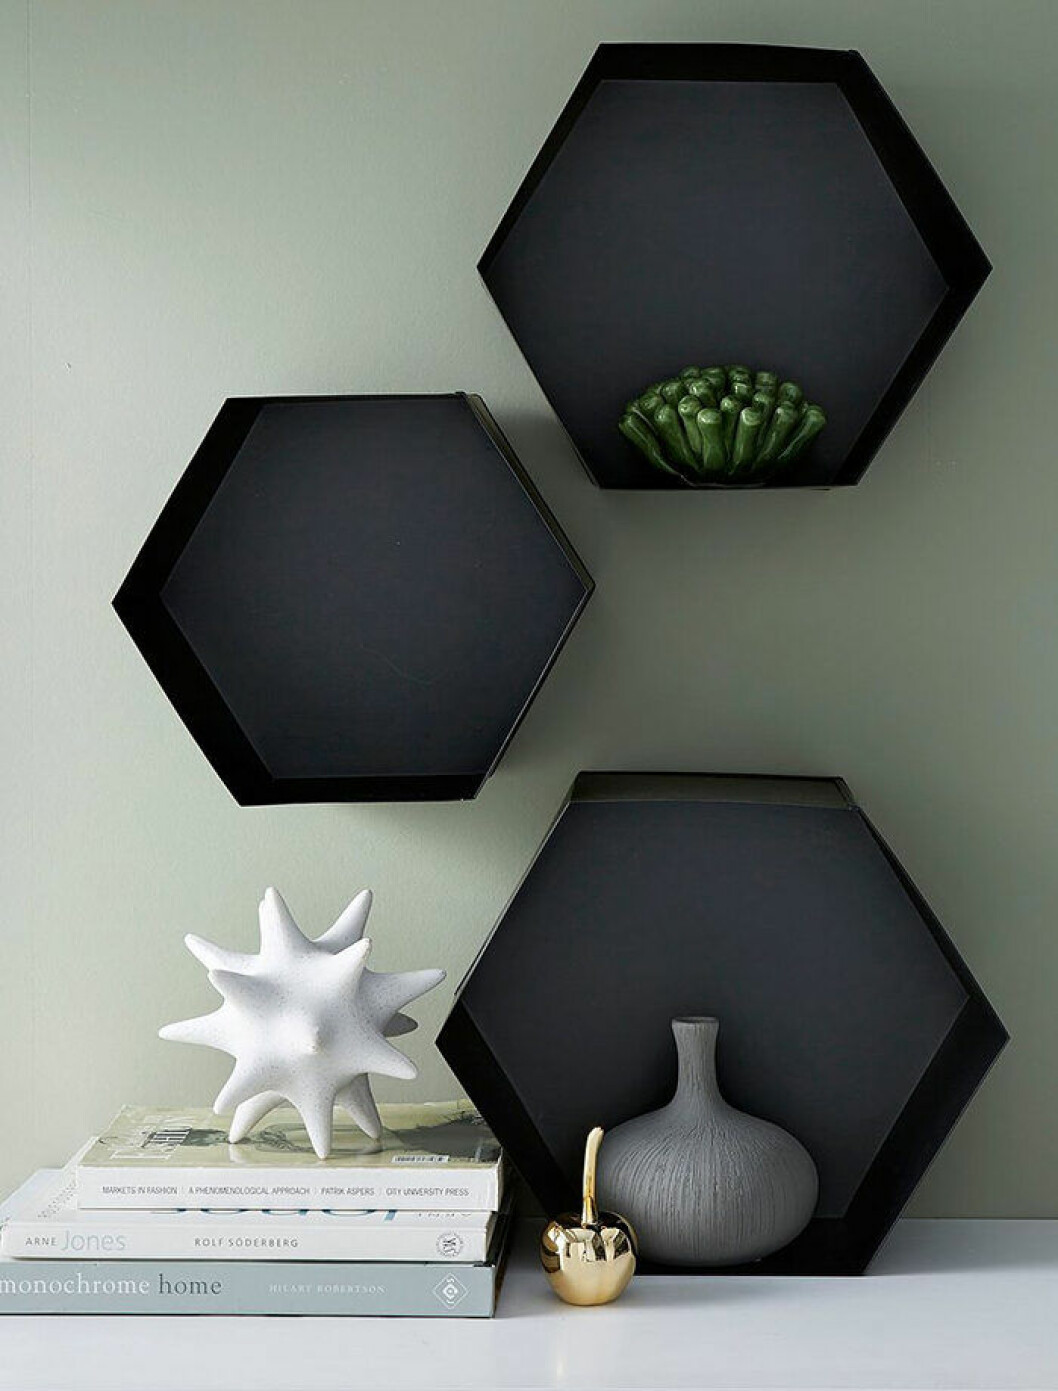 Hexagonformade hyllor från Ellos Home